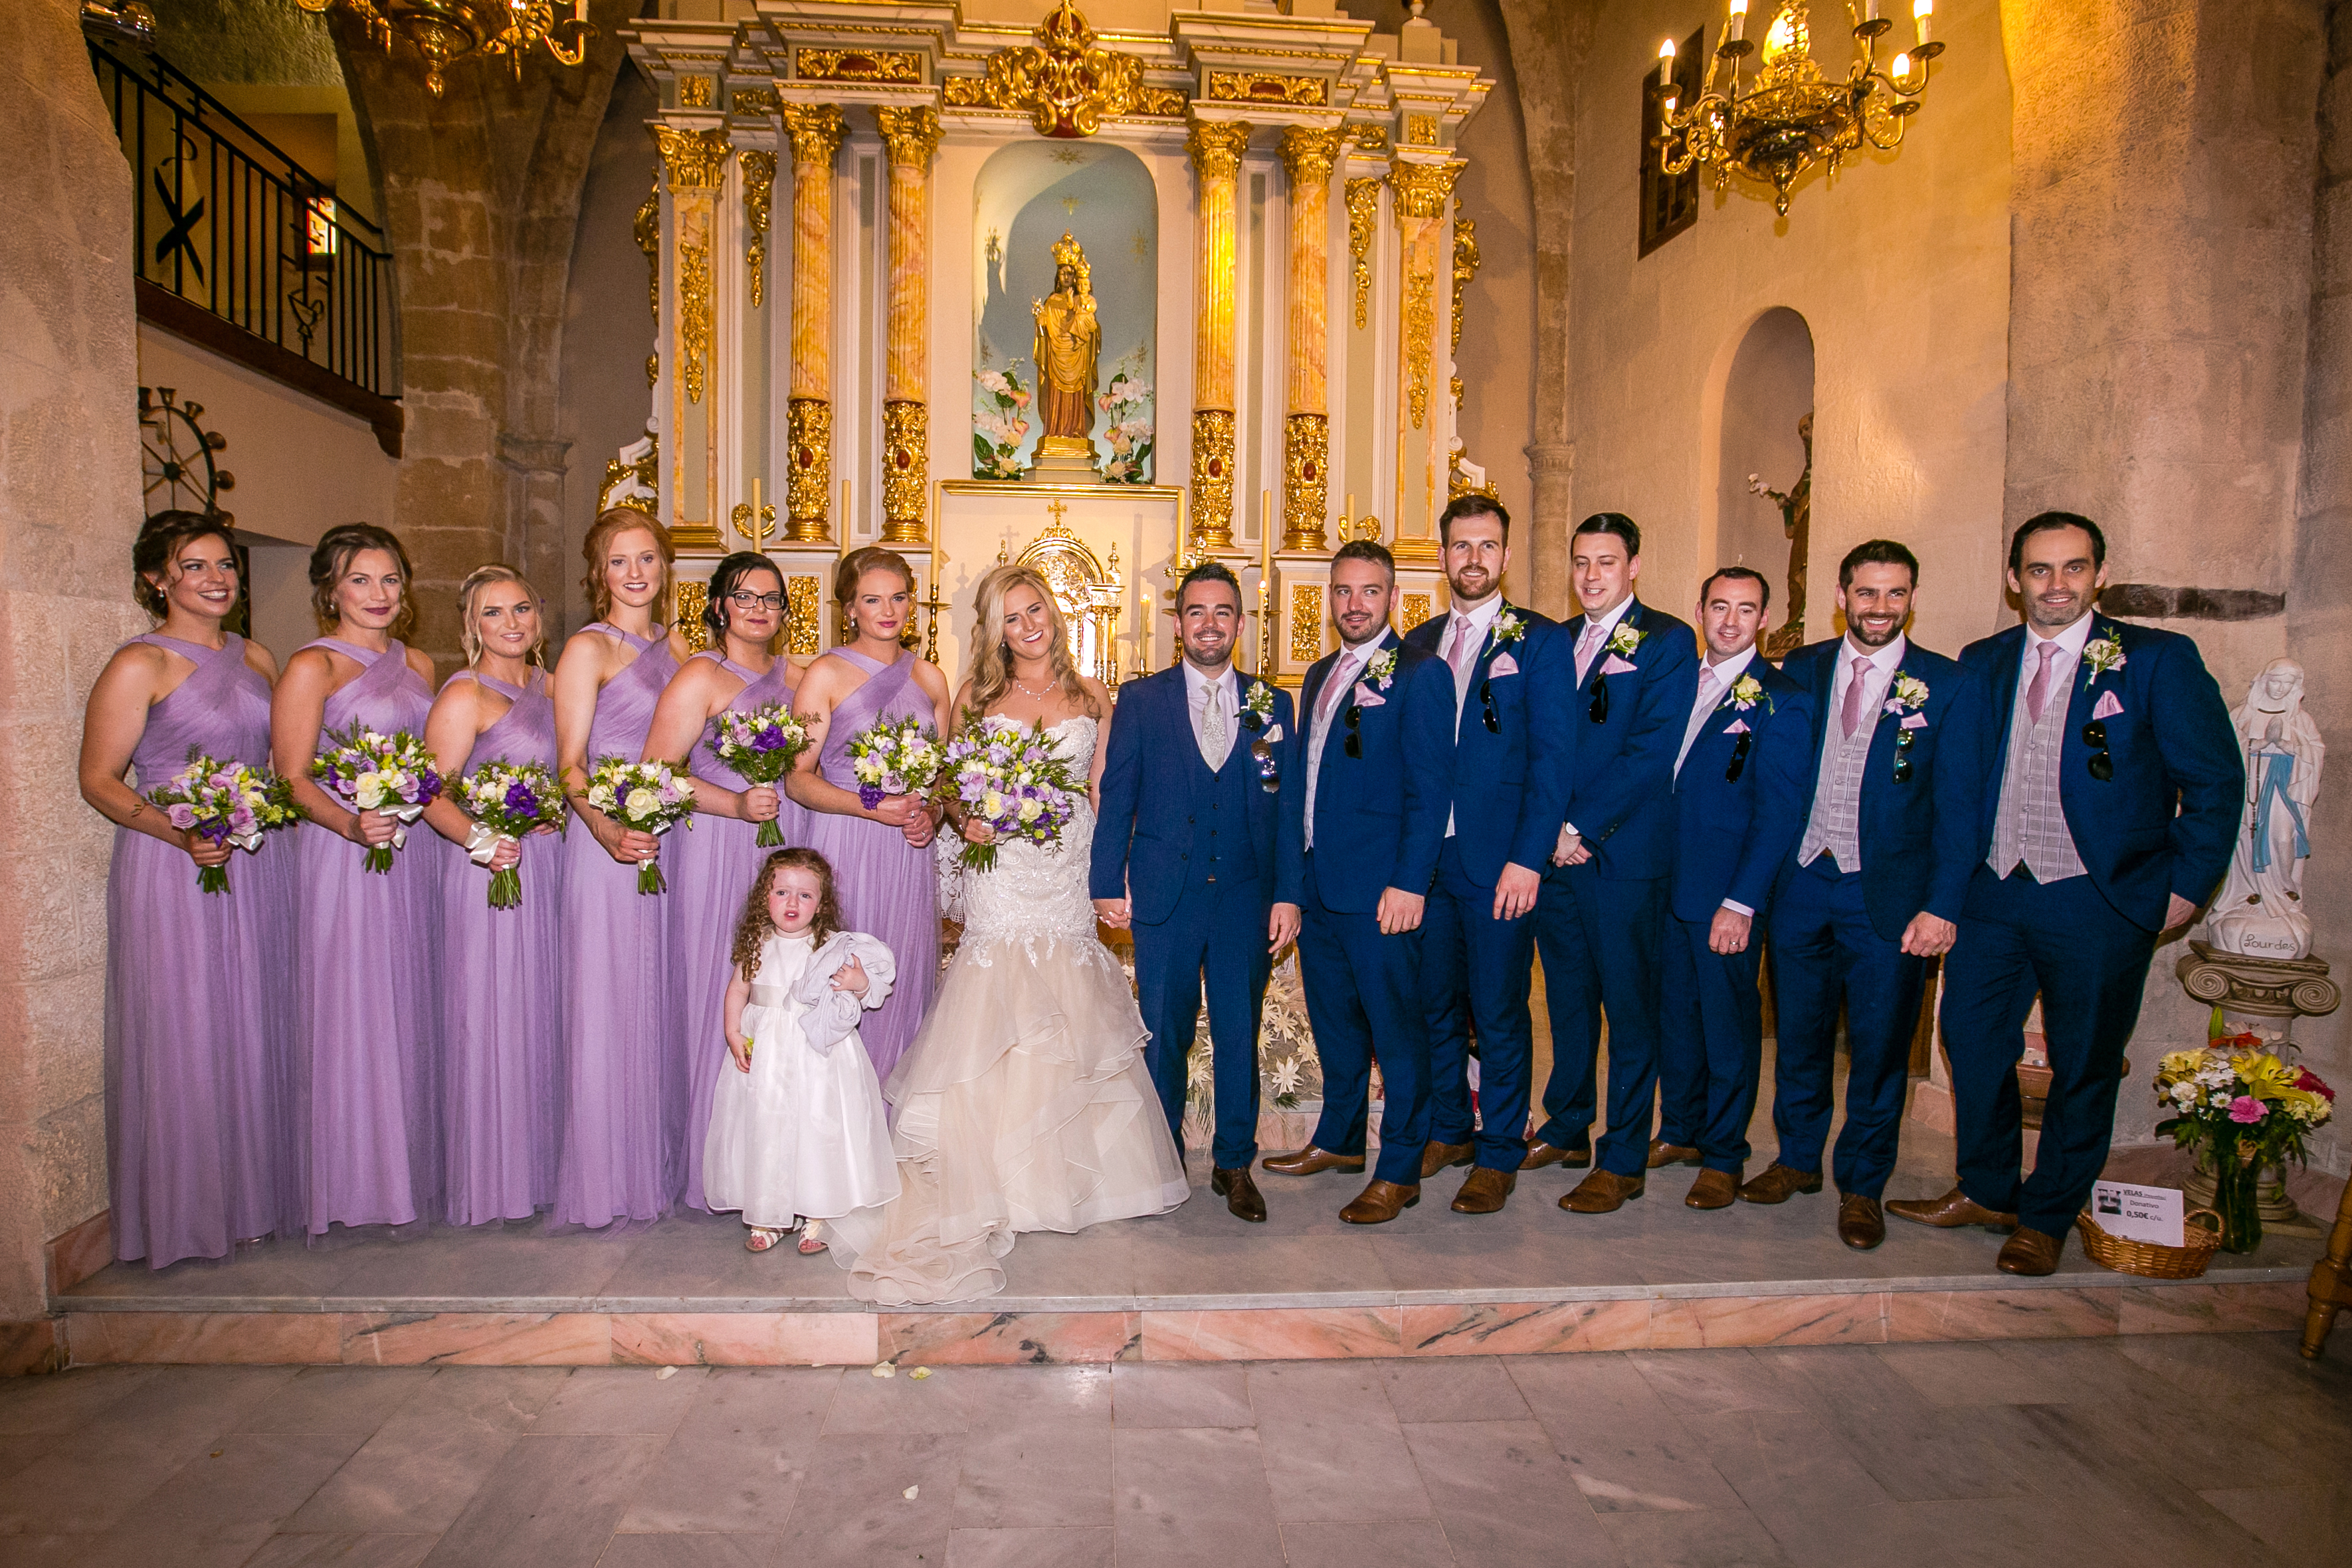 Destination Wedding In Spain By Your Dream Wedding In Spain